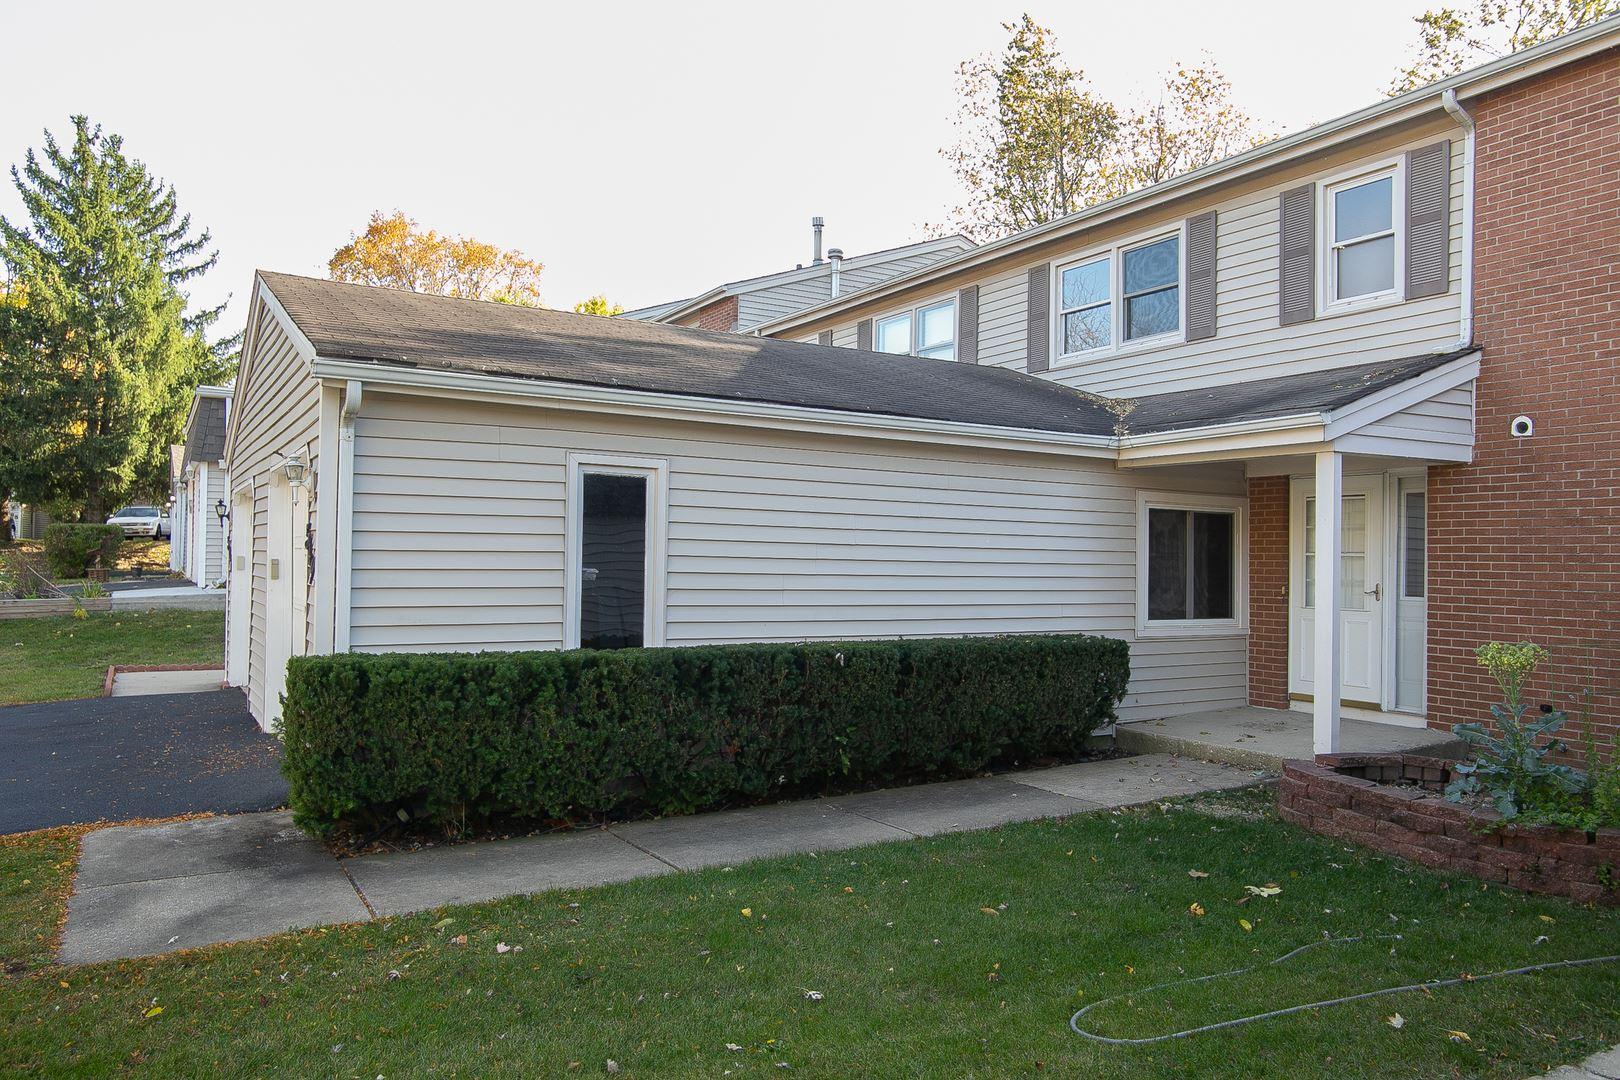 Photo of 549 Norman Road, Bolingbrook, IL 60440 (MLS # 10905969)